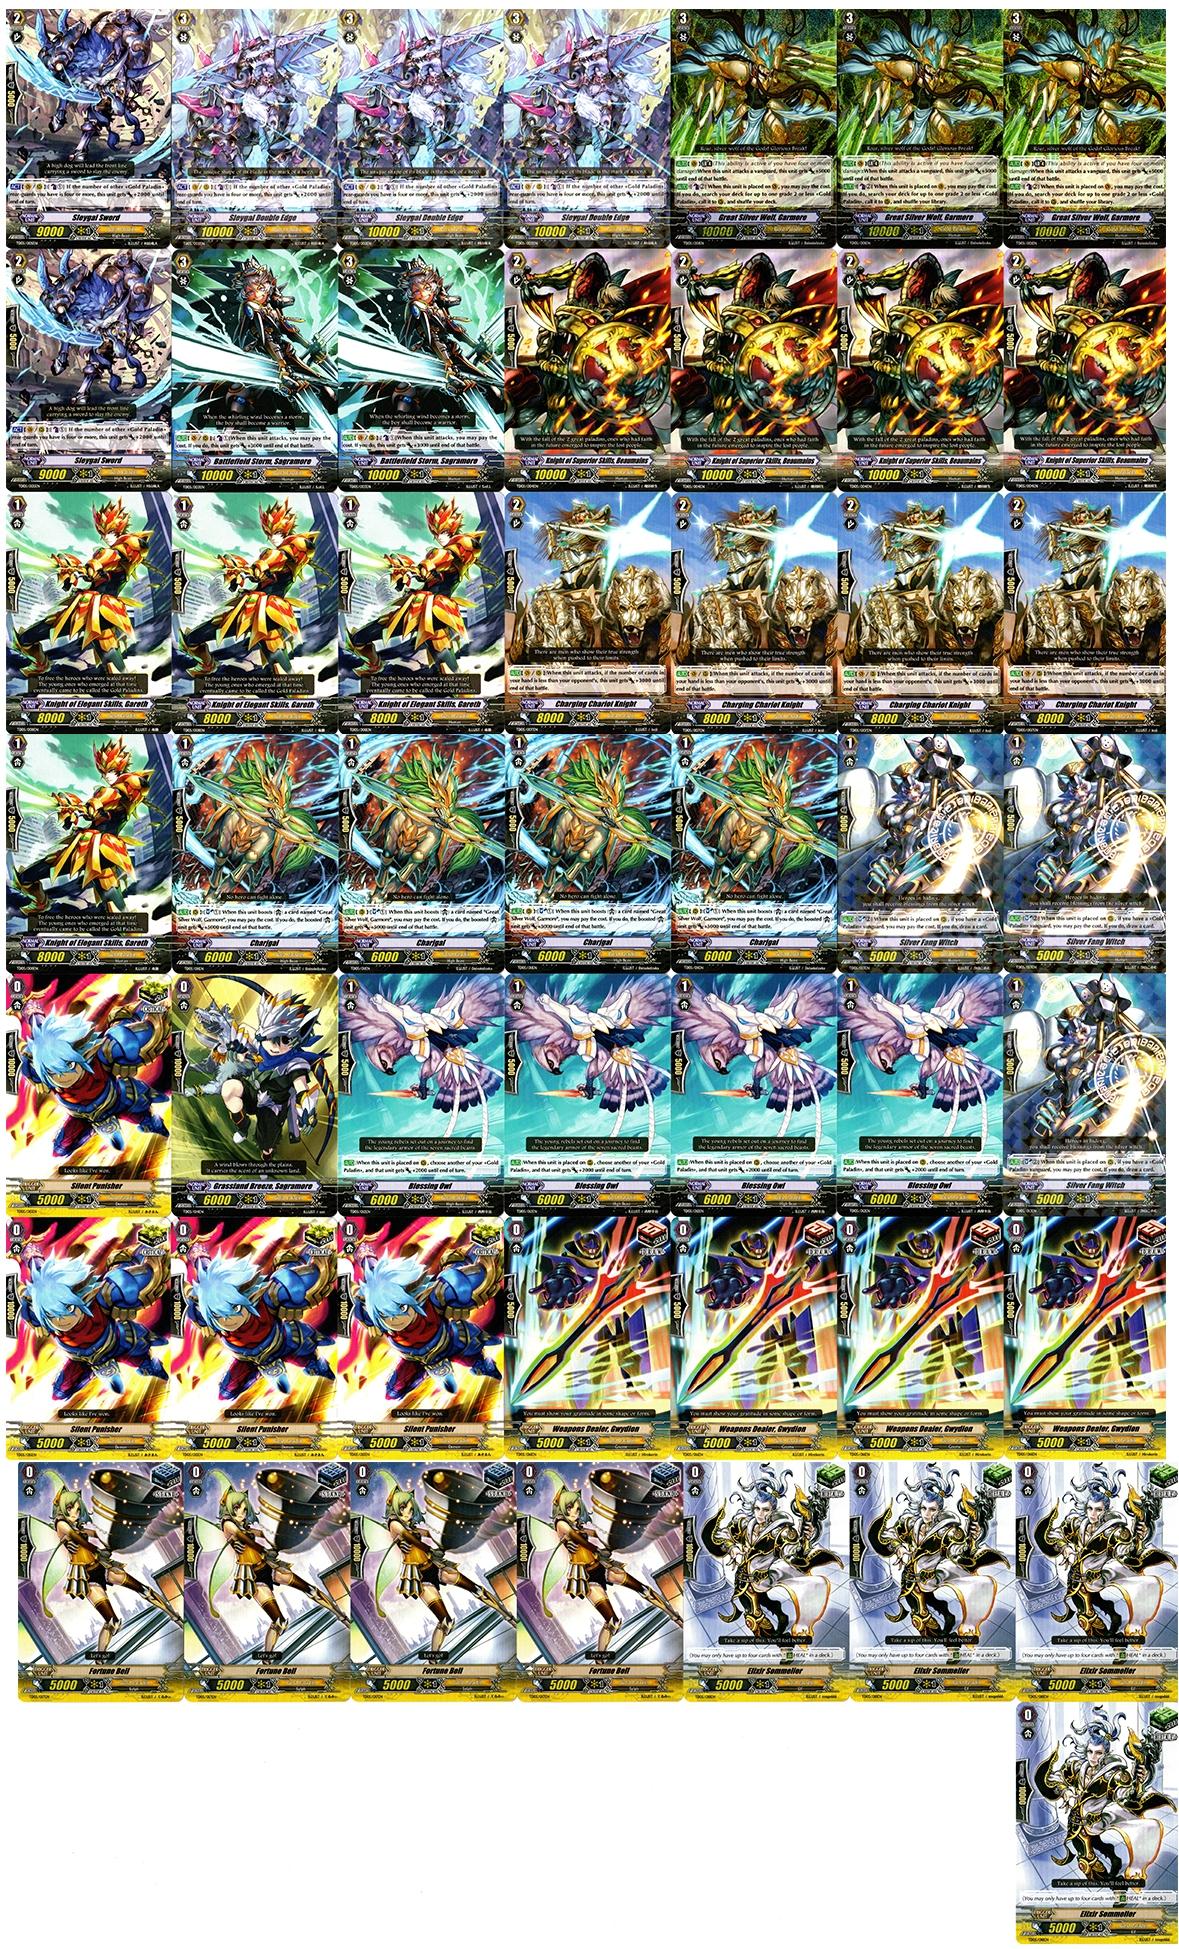 Cardfight!! Vanguard Gold Paladin Budget Deck + Sleeves